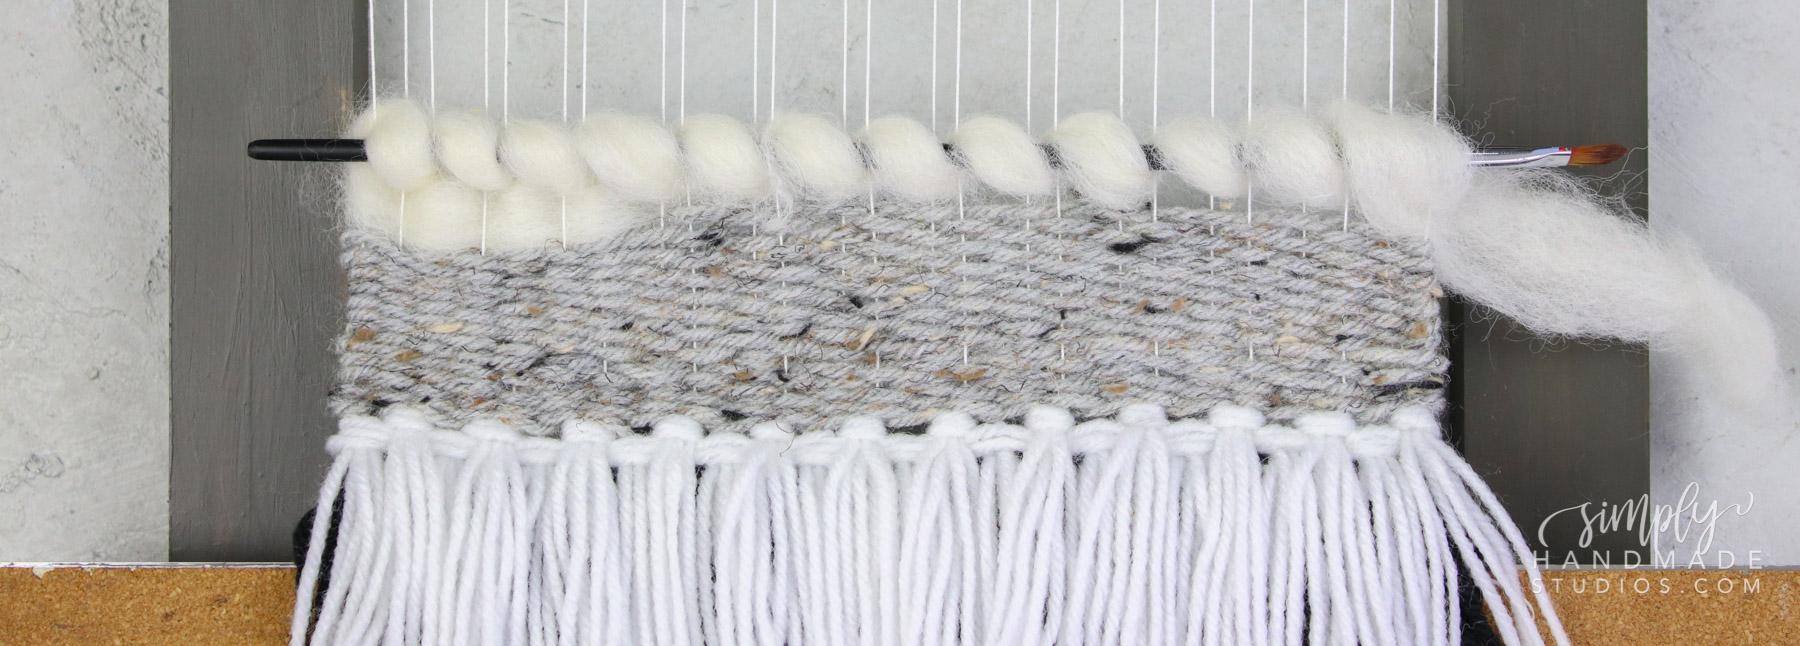 weaving yarn and roving